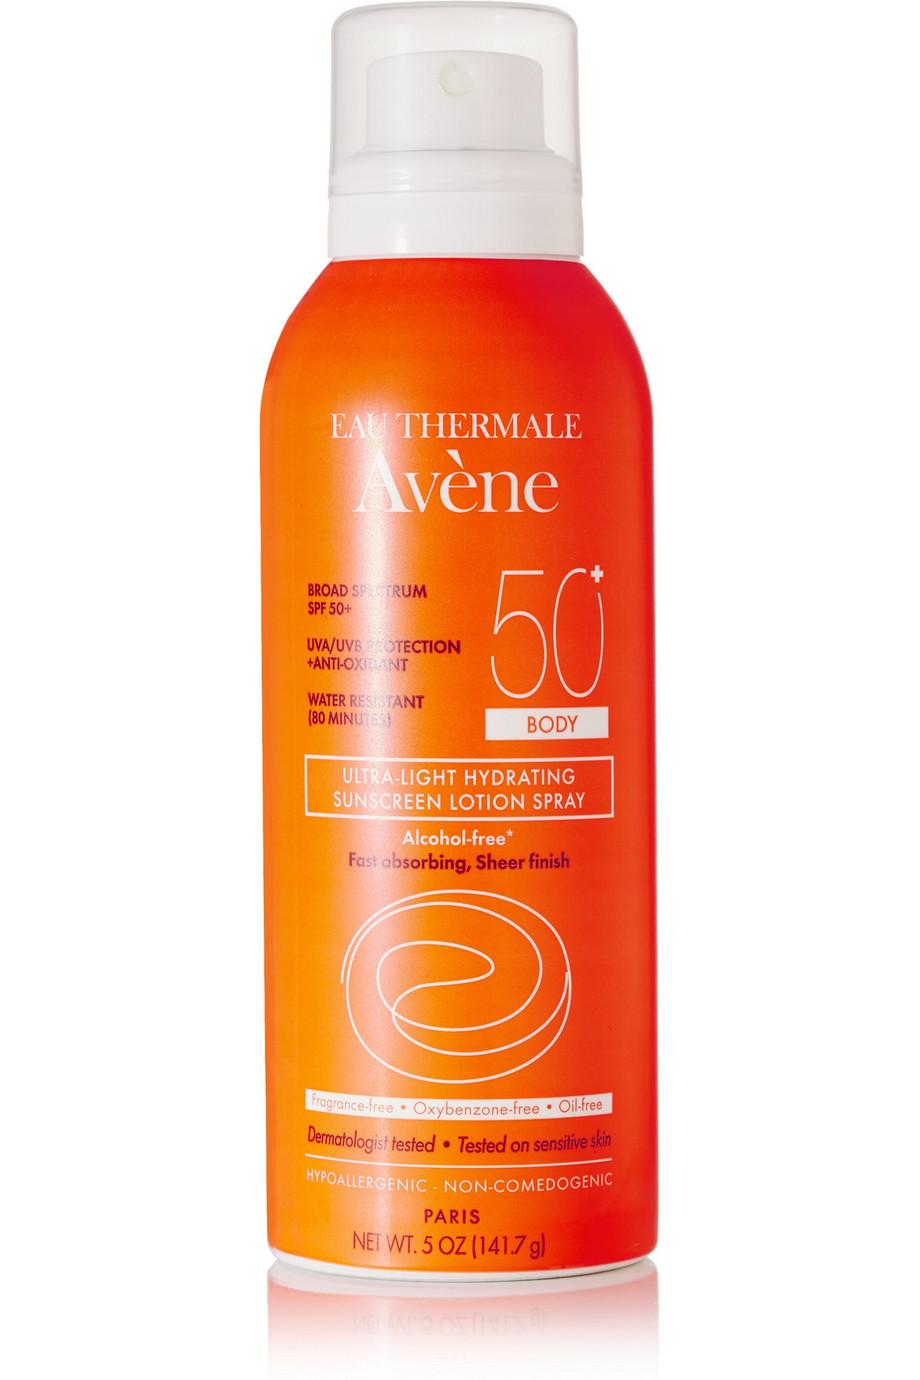 Spf50+ Ultra-Light Hydrating Sunscreen Lotion Spray, 141.7ml, by Avene